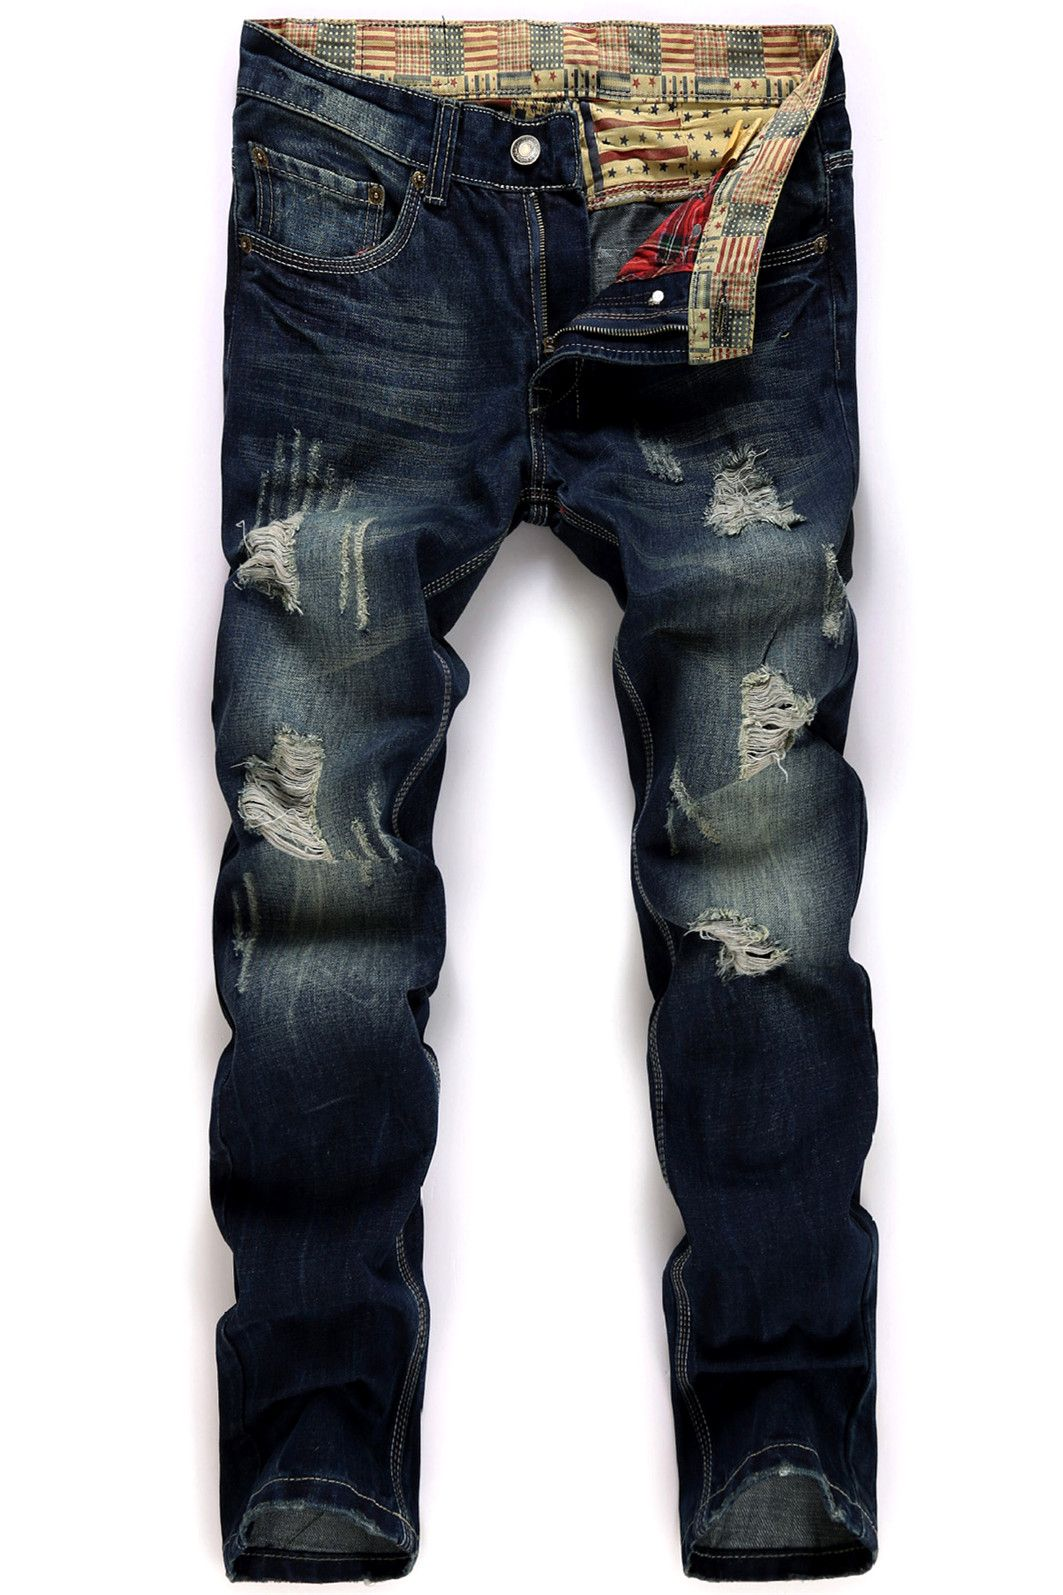 86ec4caf91d  24.88 Straight Leg Broken Hole Design Jeans